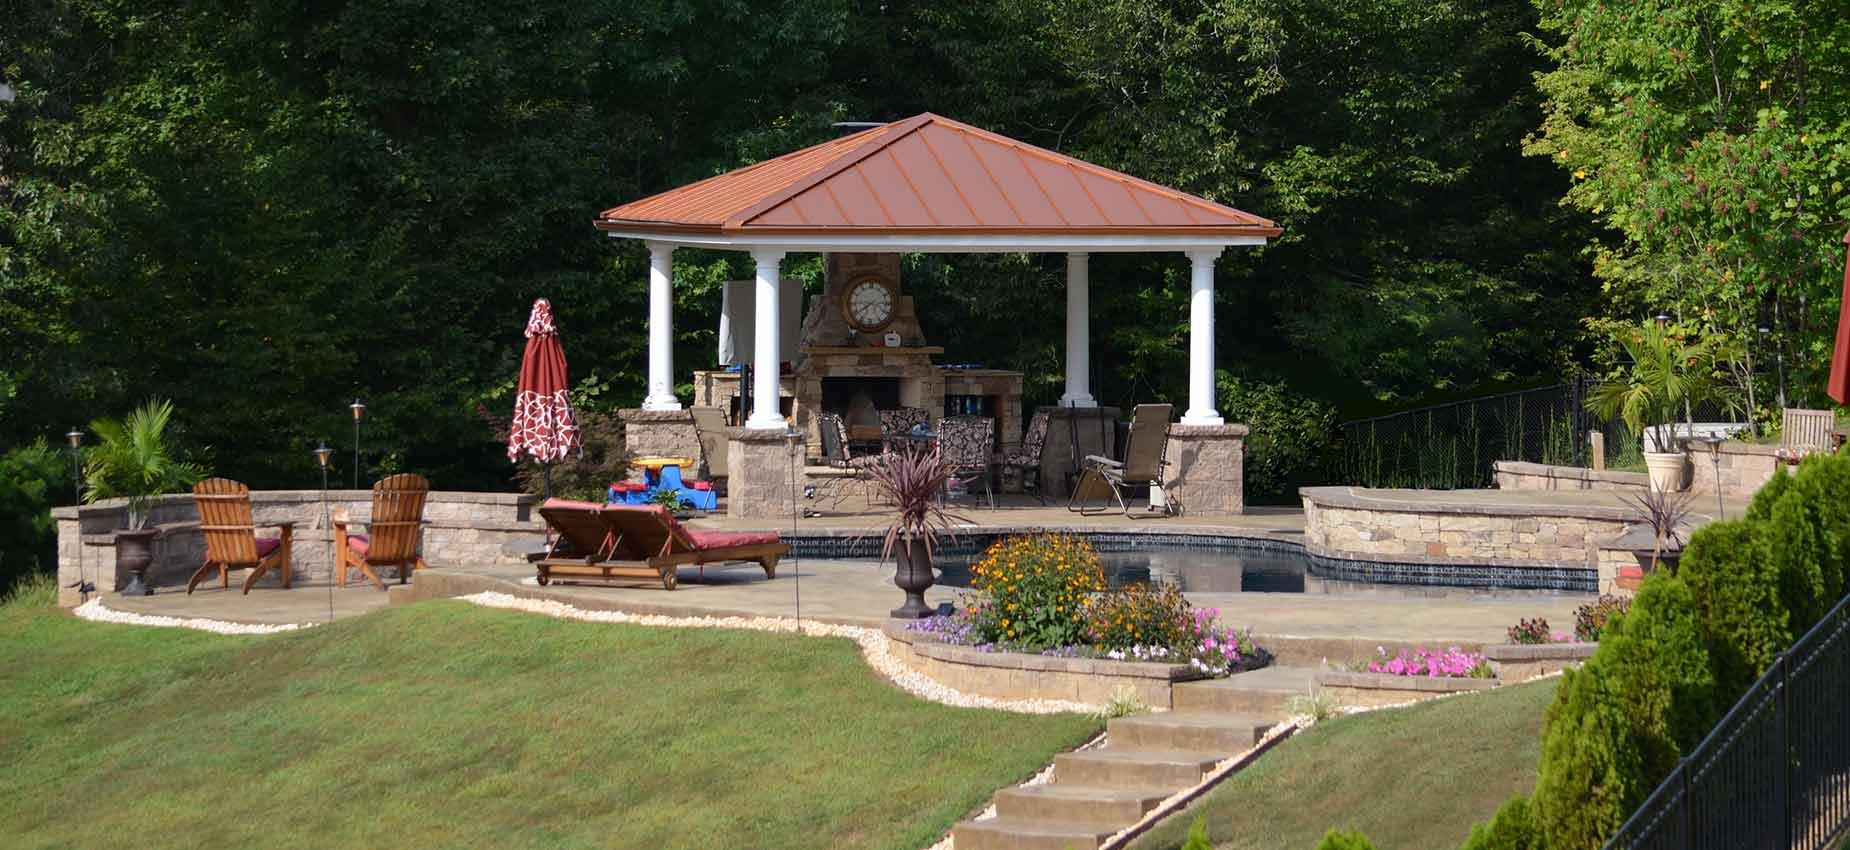 A great backyard inground swimming pool